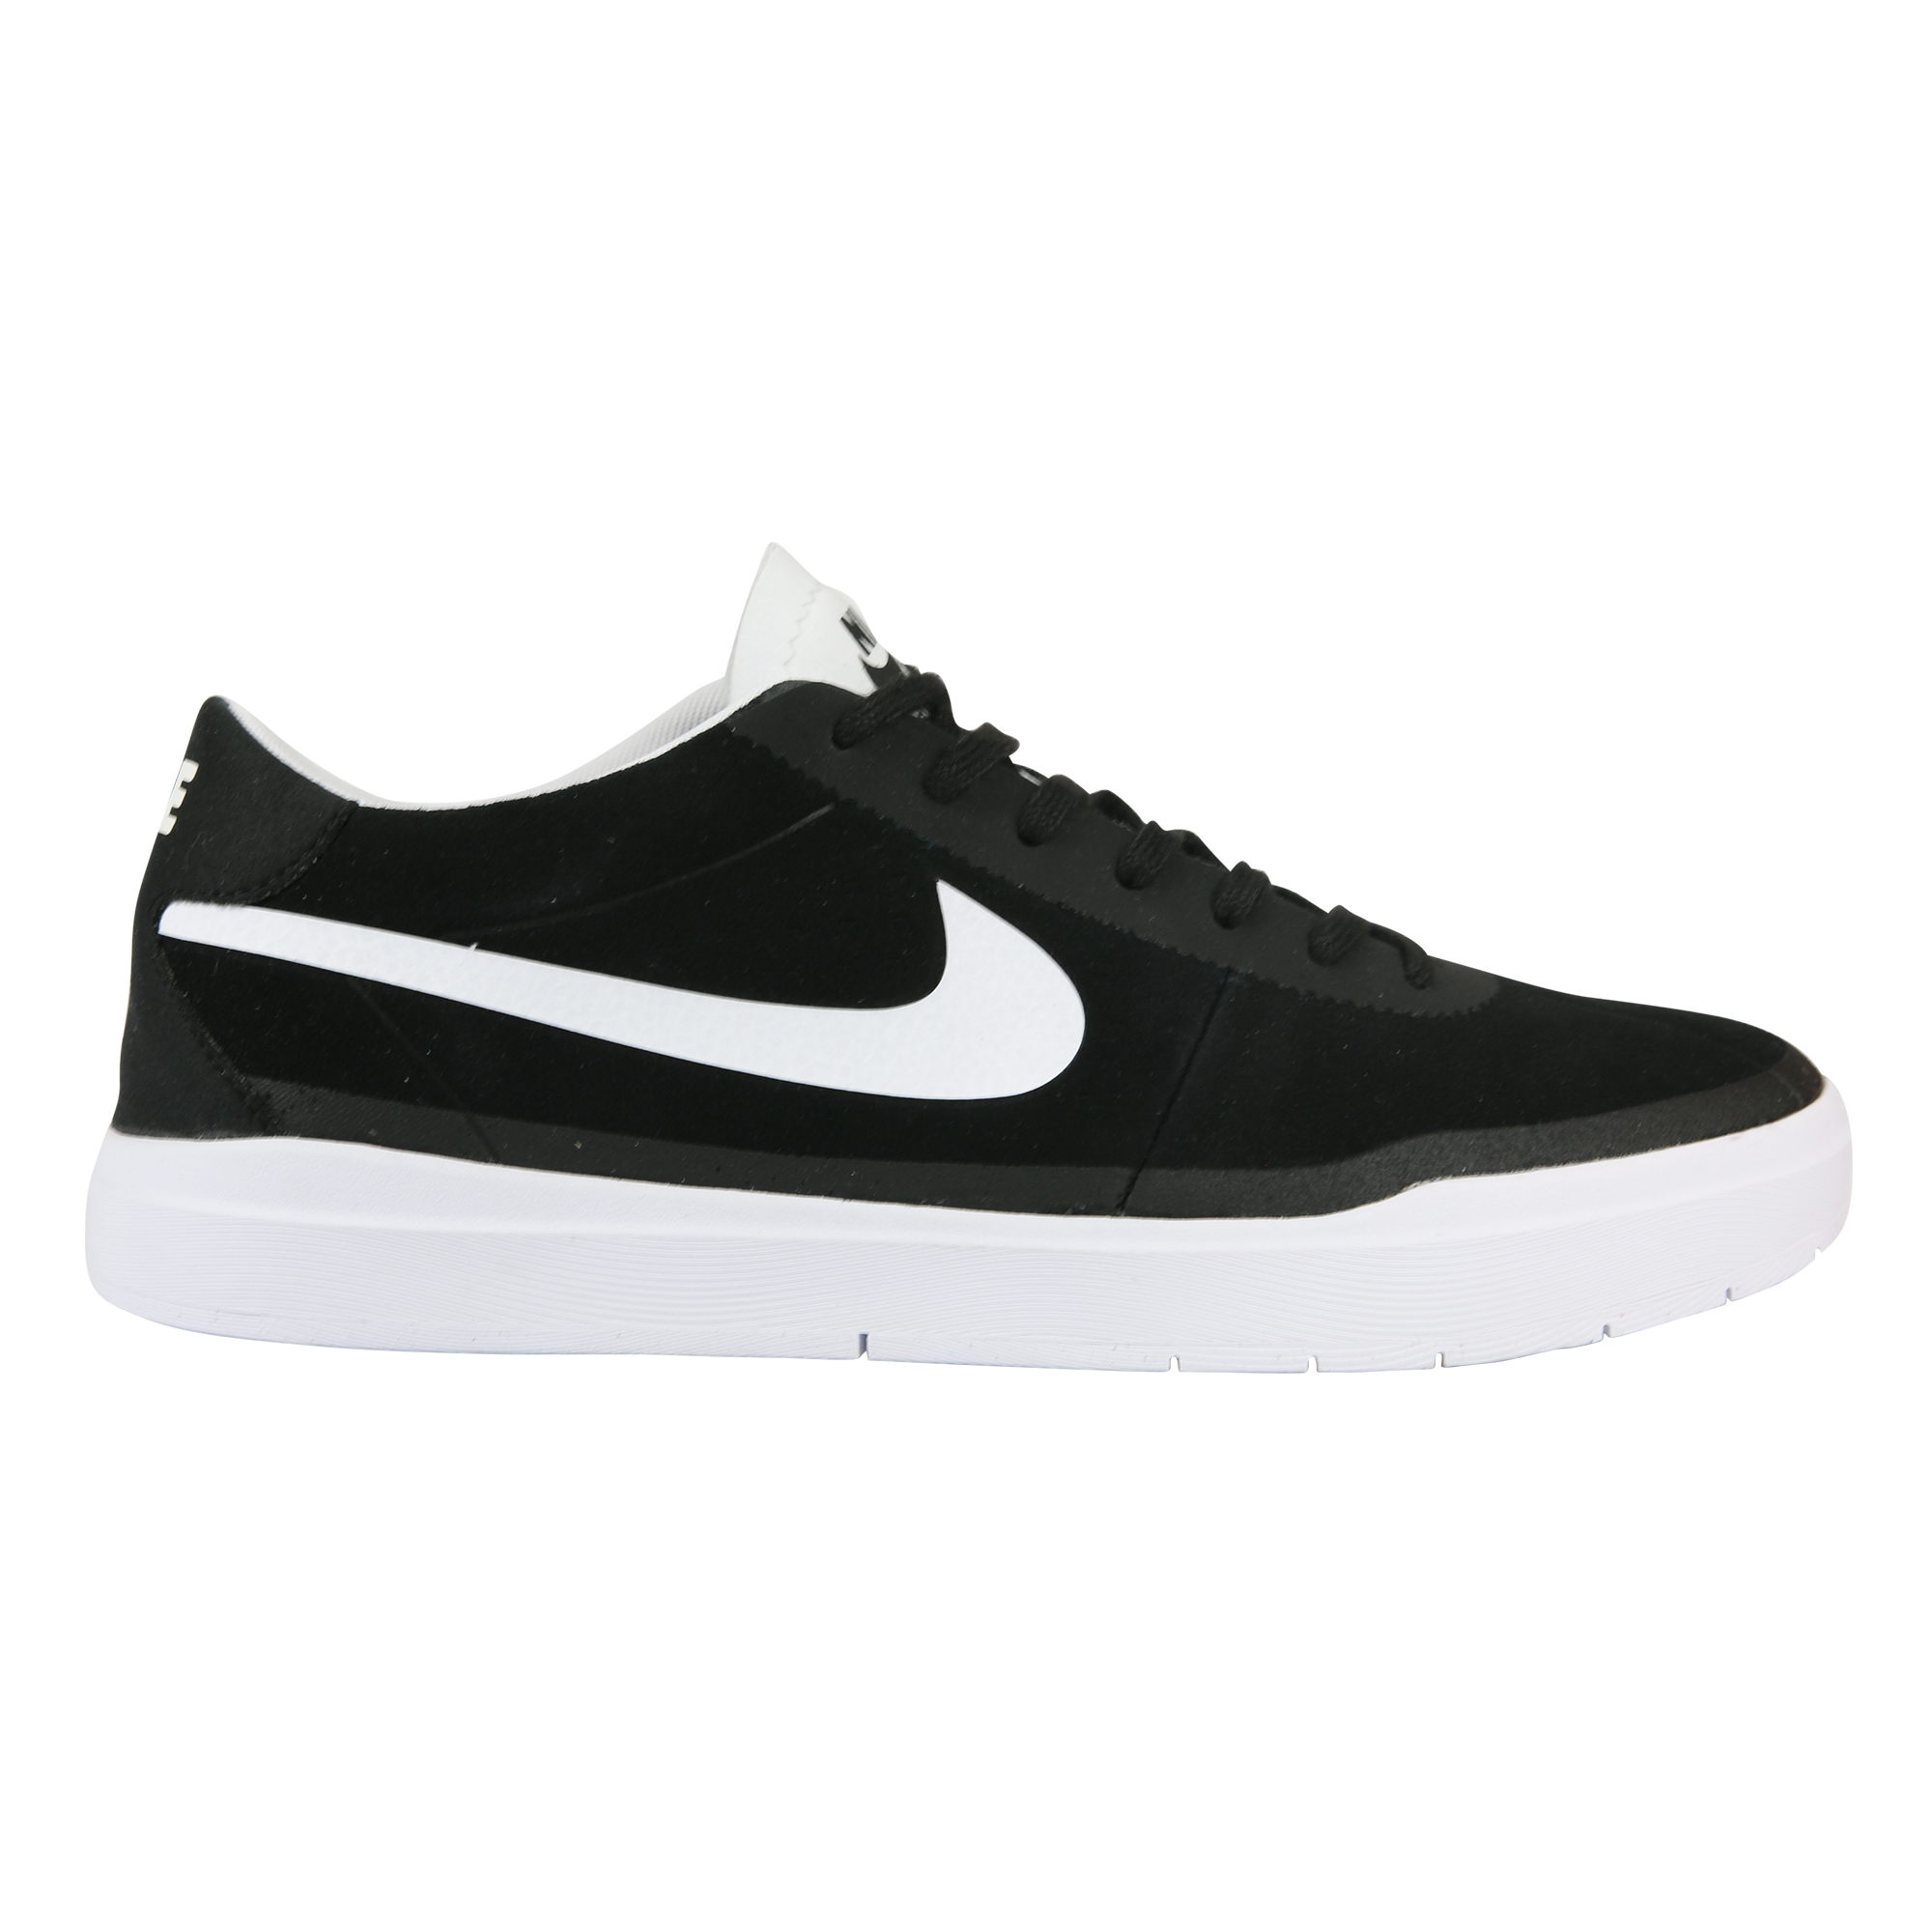 Black Suede Nike Satire Skate Shoes